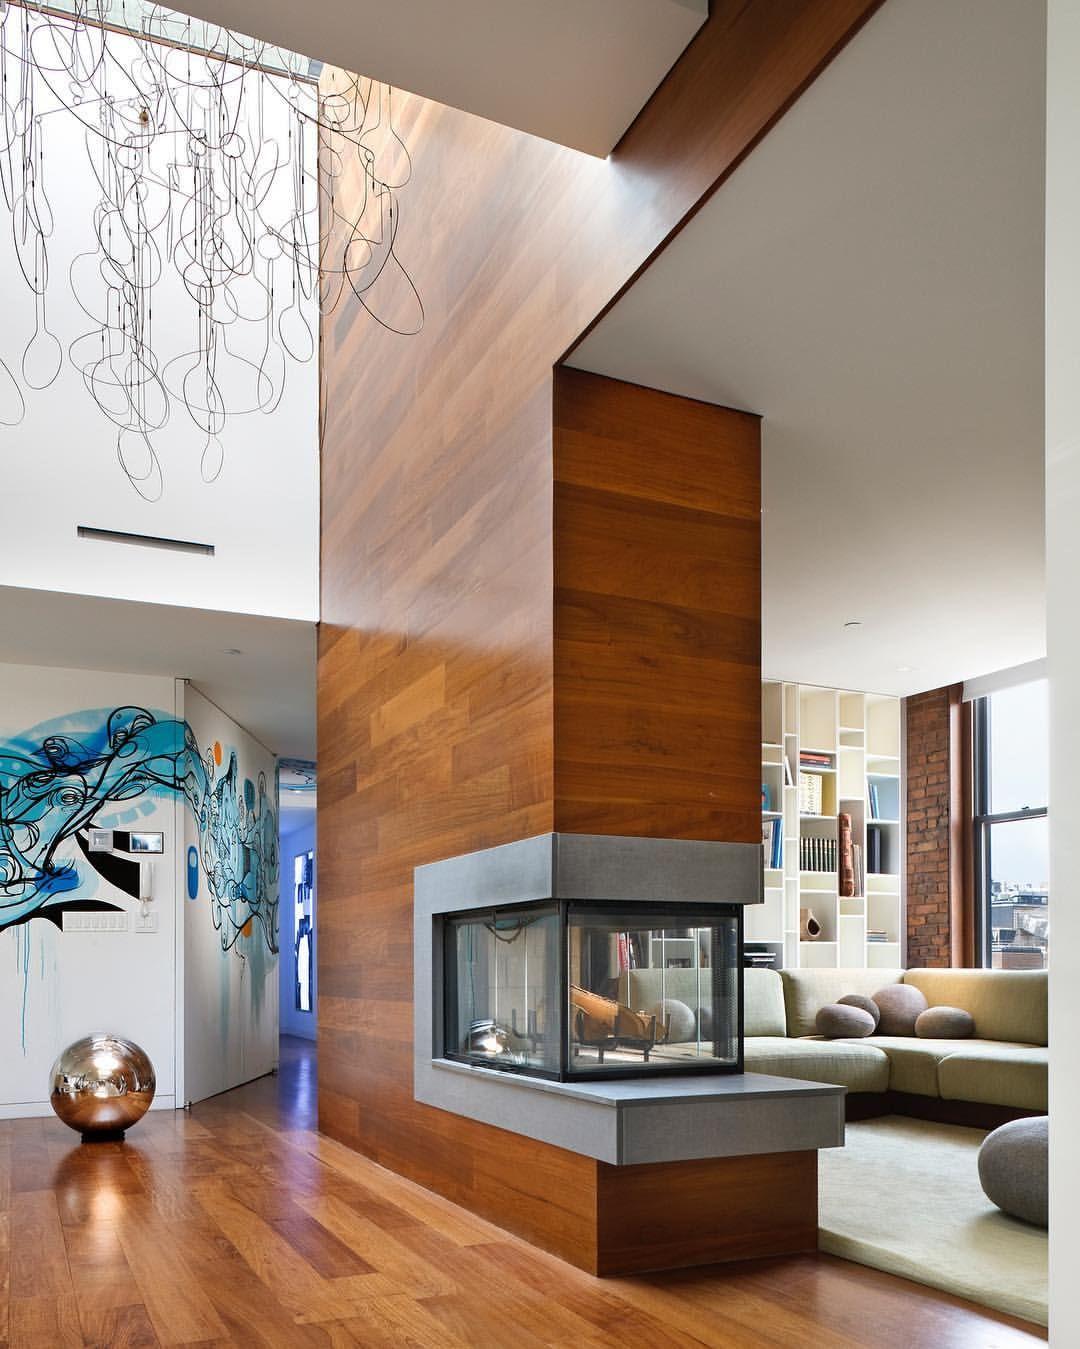 "6,222 likerklikk, 18 kommentarer – ᴀ ʀ ᴛ s ʏ ᴛ ᴇ ᴄ ᴛ ᴜ ʀ ᴇ. (@artsytecture) på Instagram: ""Broadway Penthouse. By Joel Sanders Architect 📐 Located in Manhattan, New York📍🇺🇸 #artsytecture…"""